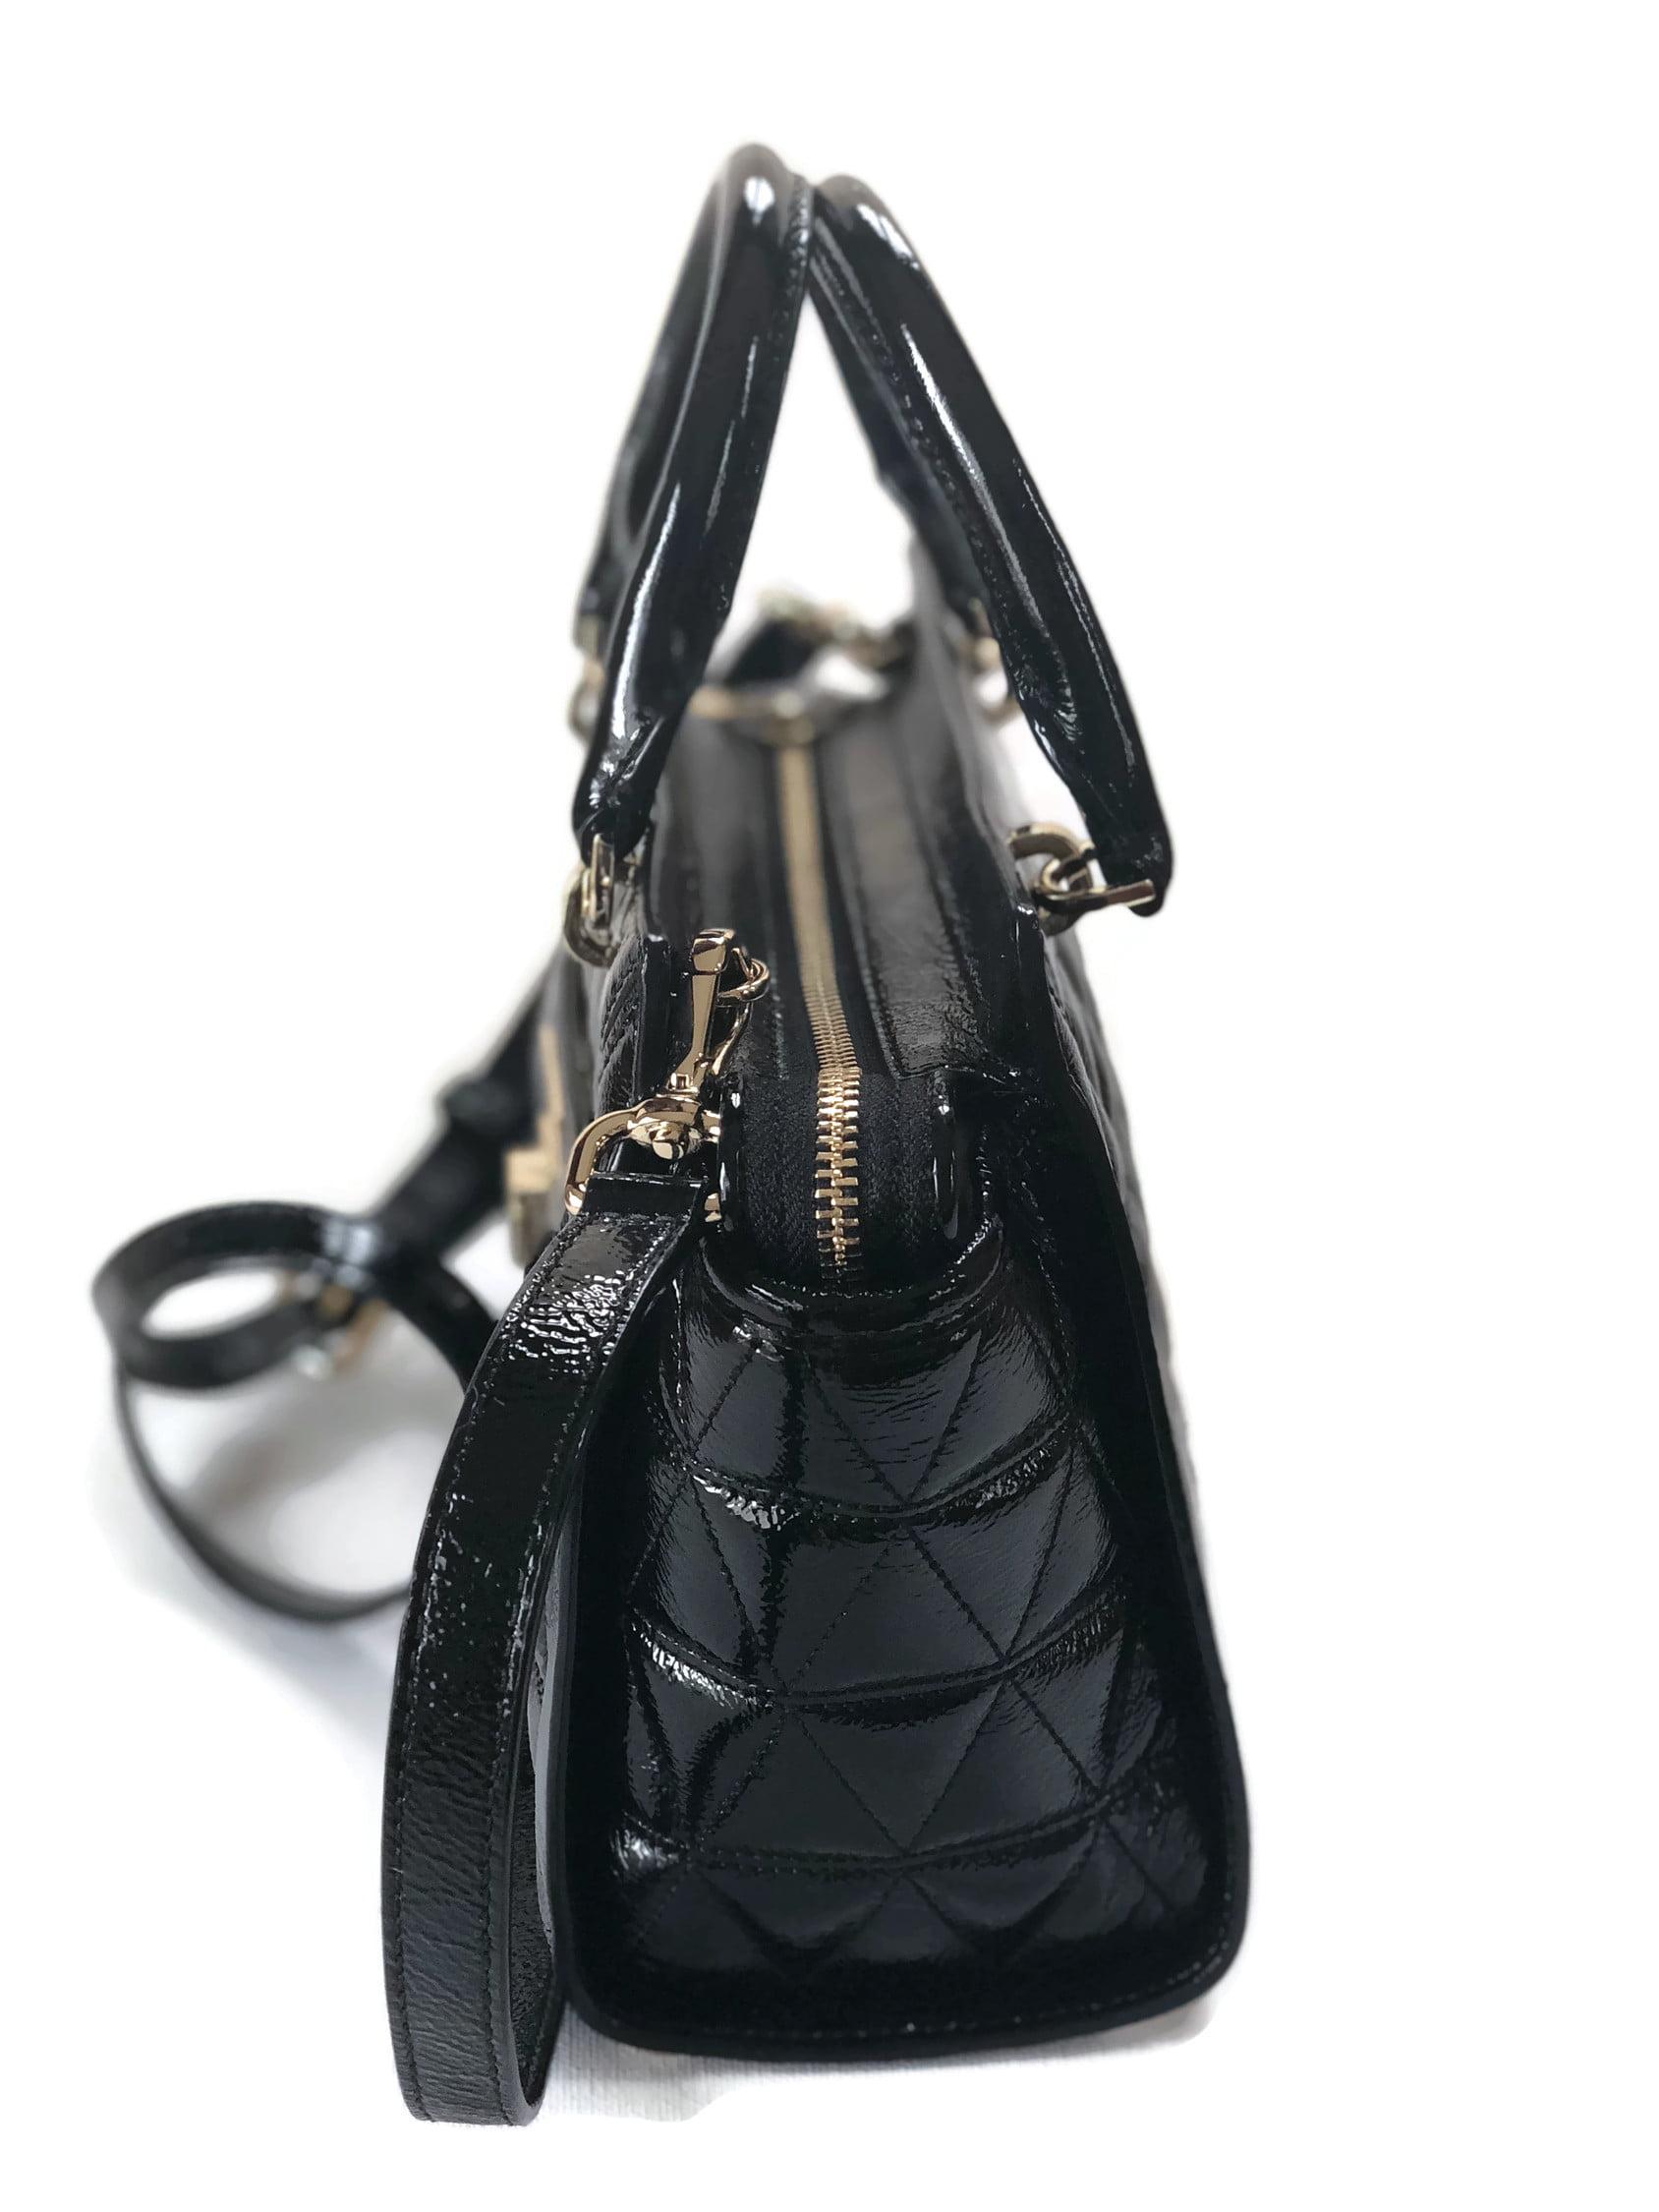 de7f044653 MICHAEL Michael Kors Vivianne Small Shoulder Messenger Patent Leather  Handbag Messenger - Black - Walmart.com